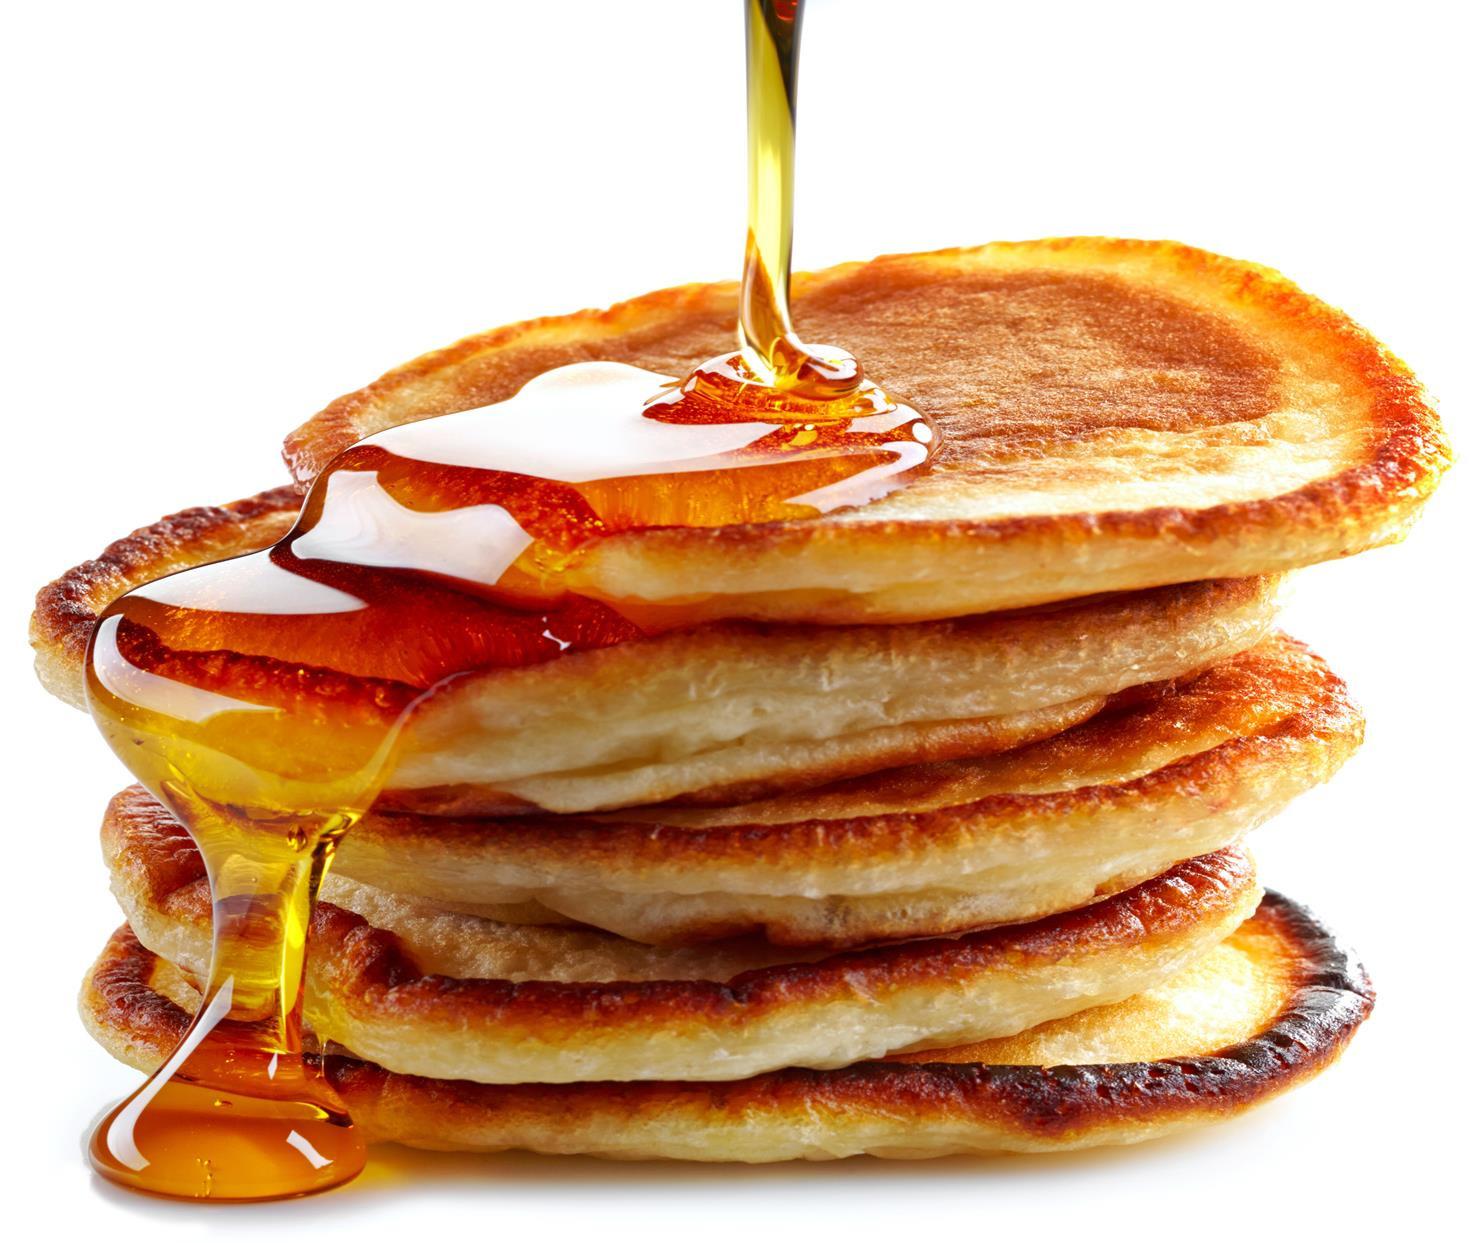 Pancakes For Breakfast  K of C Pancake Breakfast St Joseph Parish of Downingtown